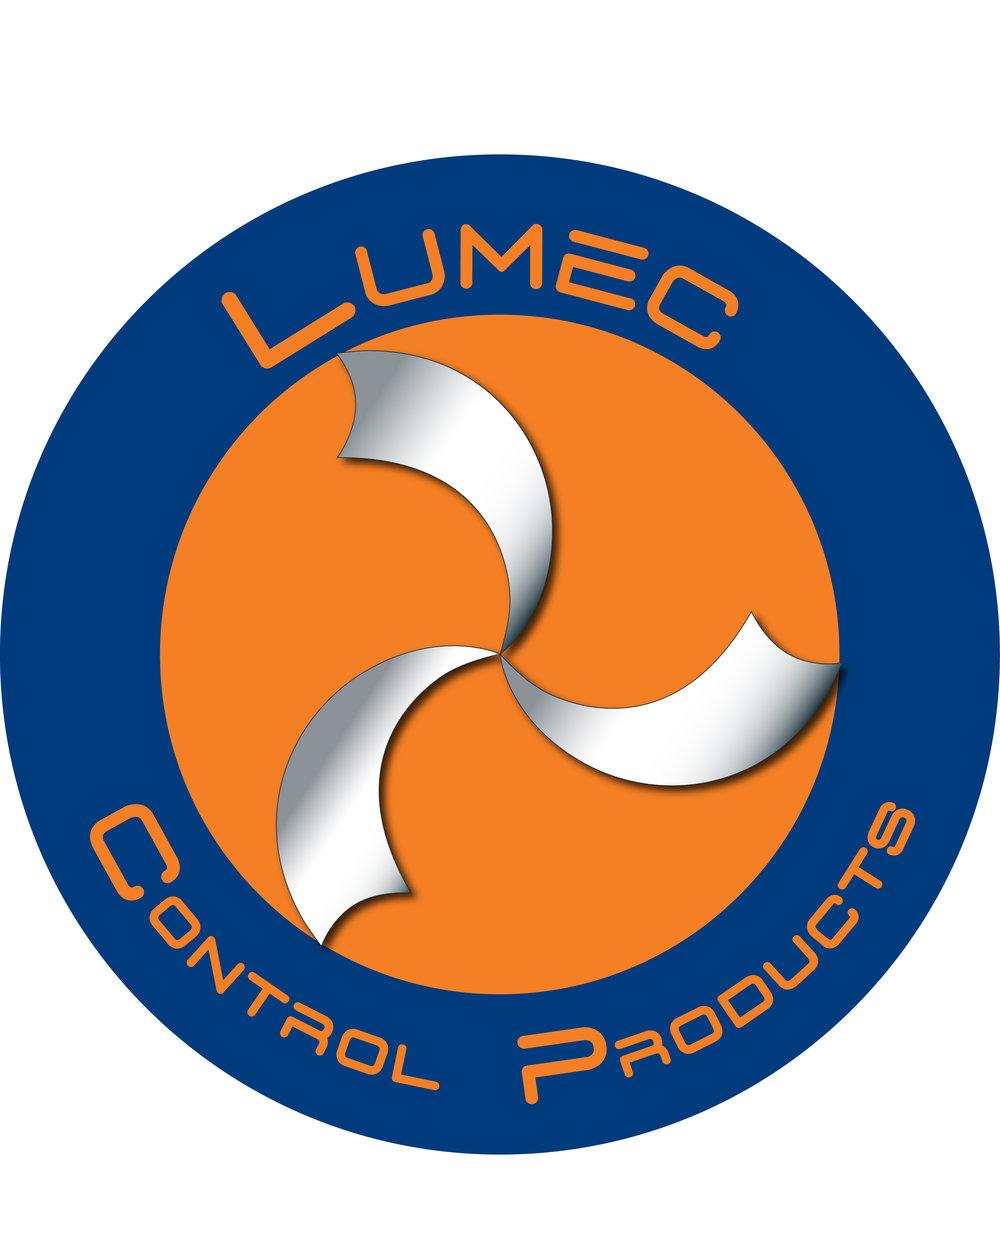 Lumec logo.jpg